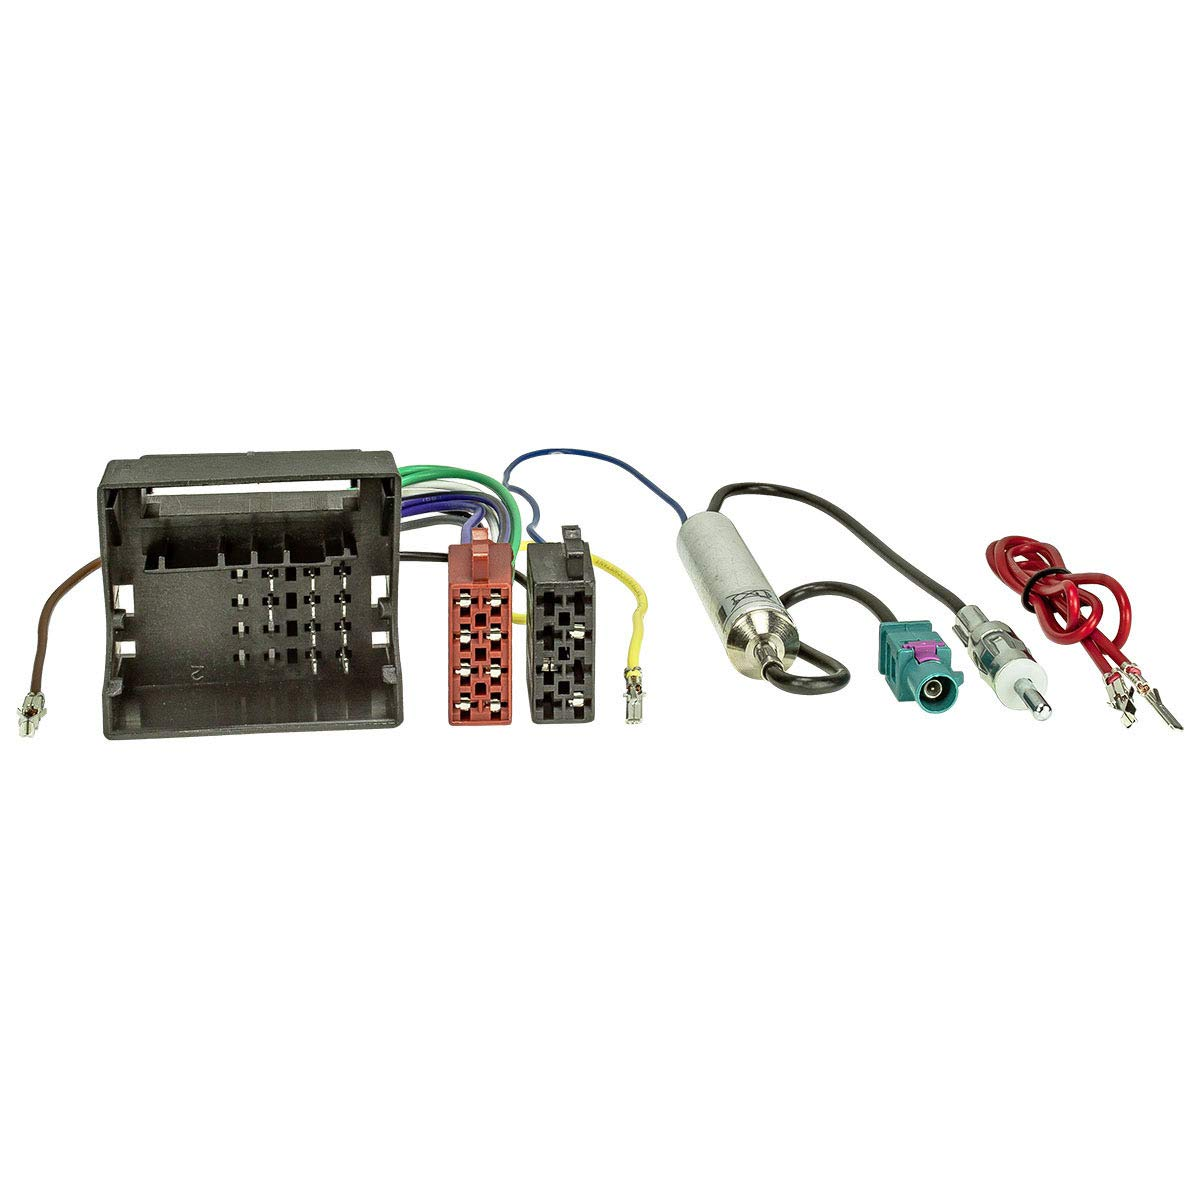 tomzz Audio 2457-018 Radioblende Set Profi-Version extrem stabil passend f/ür VW Polo,Fox mit Quadlockadapter ISO Fakra Antennenadapter Phantomeinspeisung DIN ISO